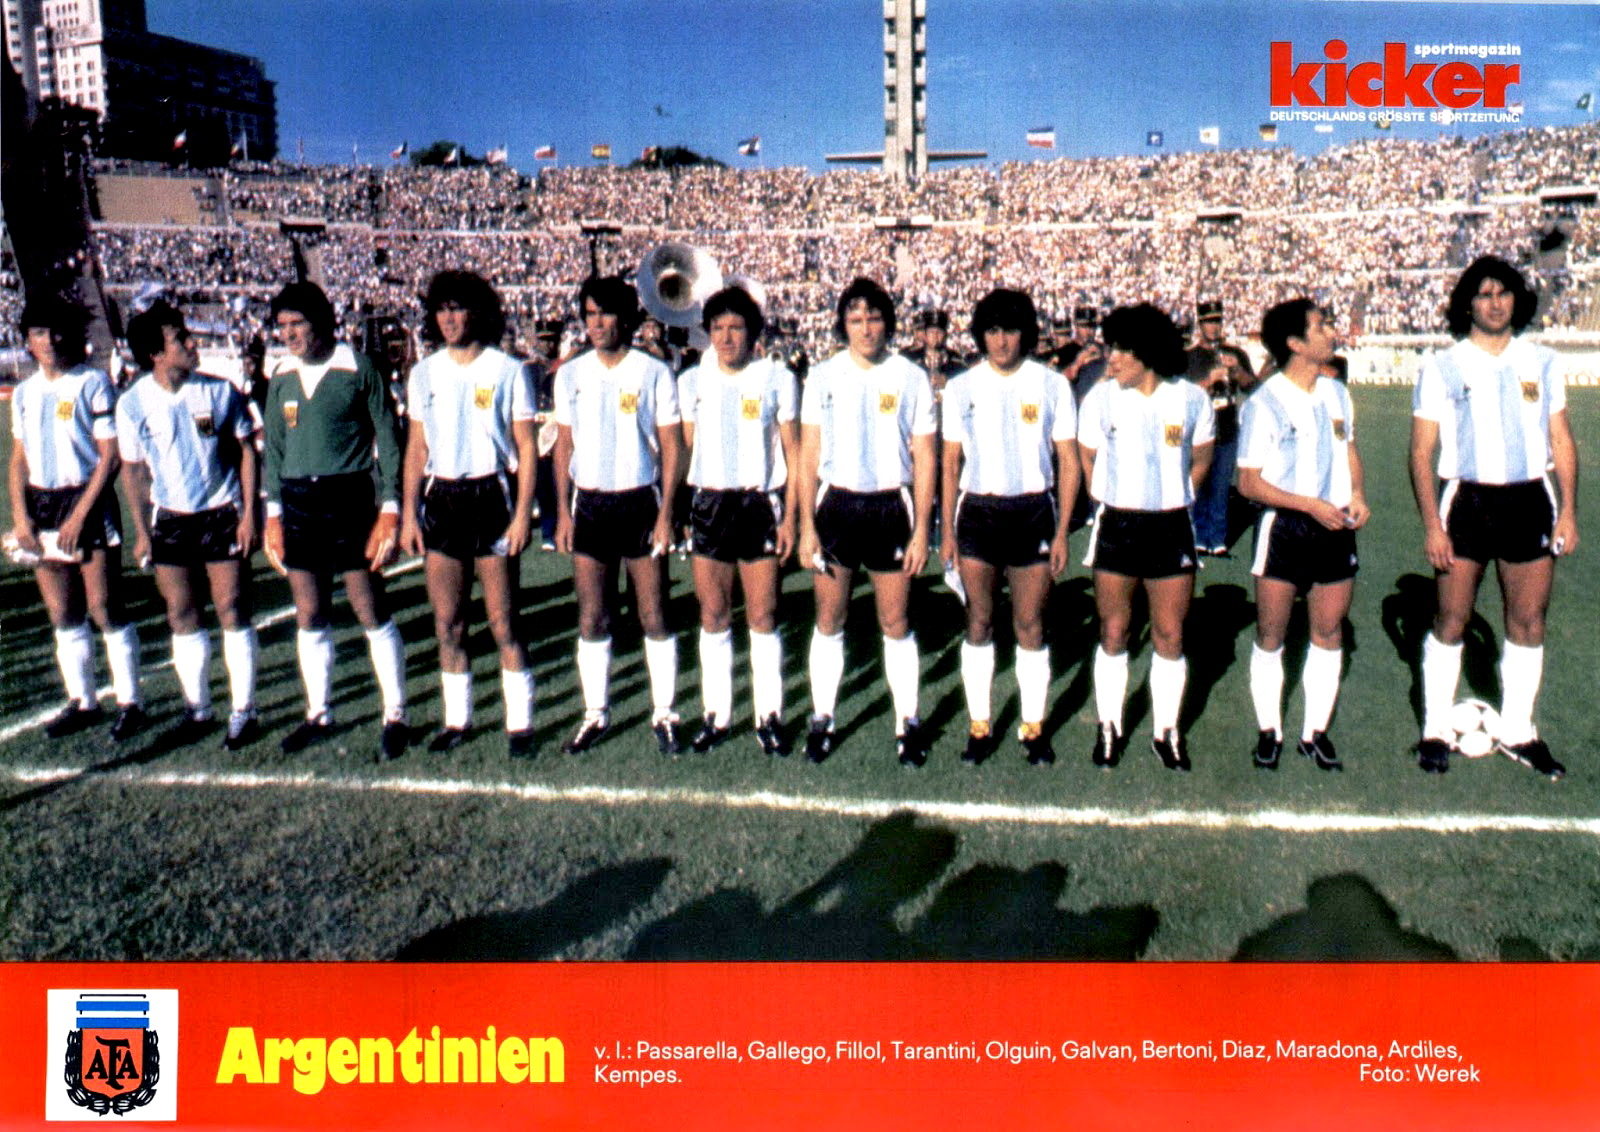 ¿Cuánto mide Diego Armando Maradona? - Altura - Real height Argentina%2B1981%2B01%2B01b